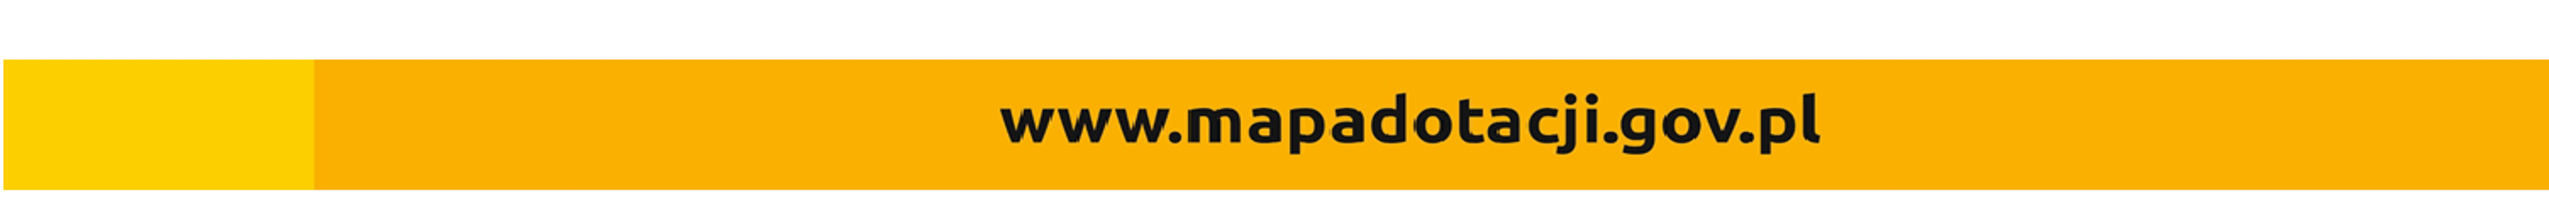 mapadotacji.gov